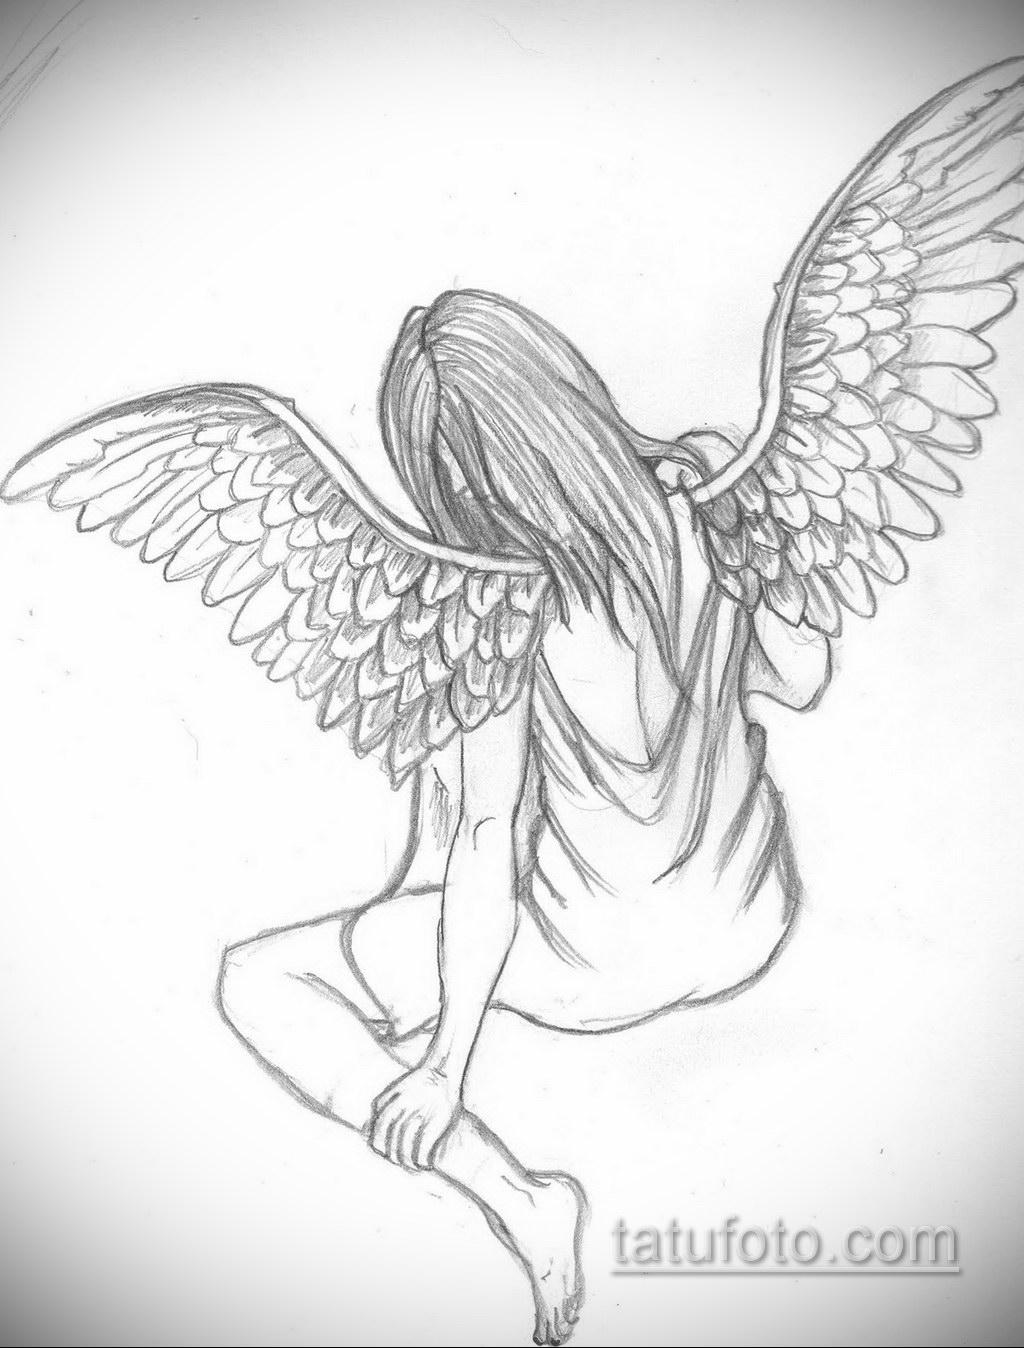 Фото ангельского рисунка тату 22.11.2020 №077 -Angelic tattoo- tatufoto.com